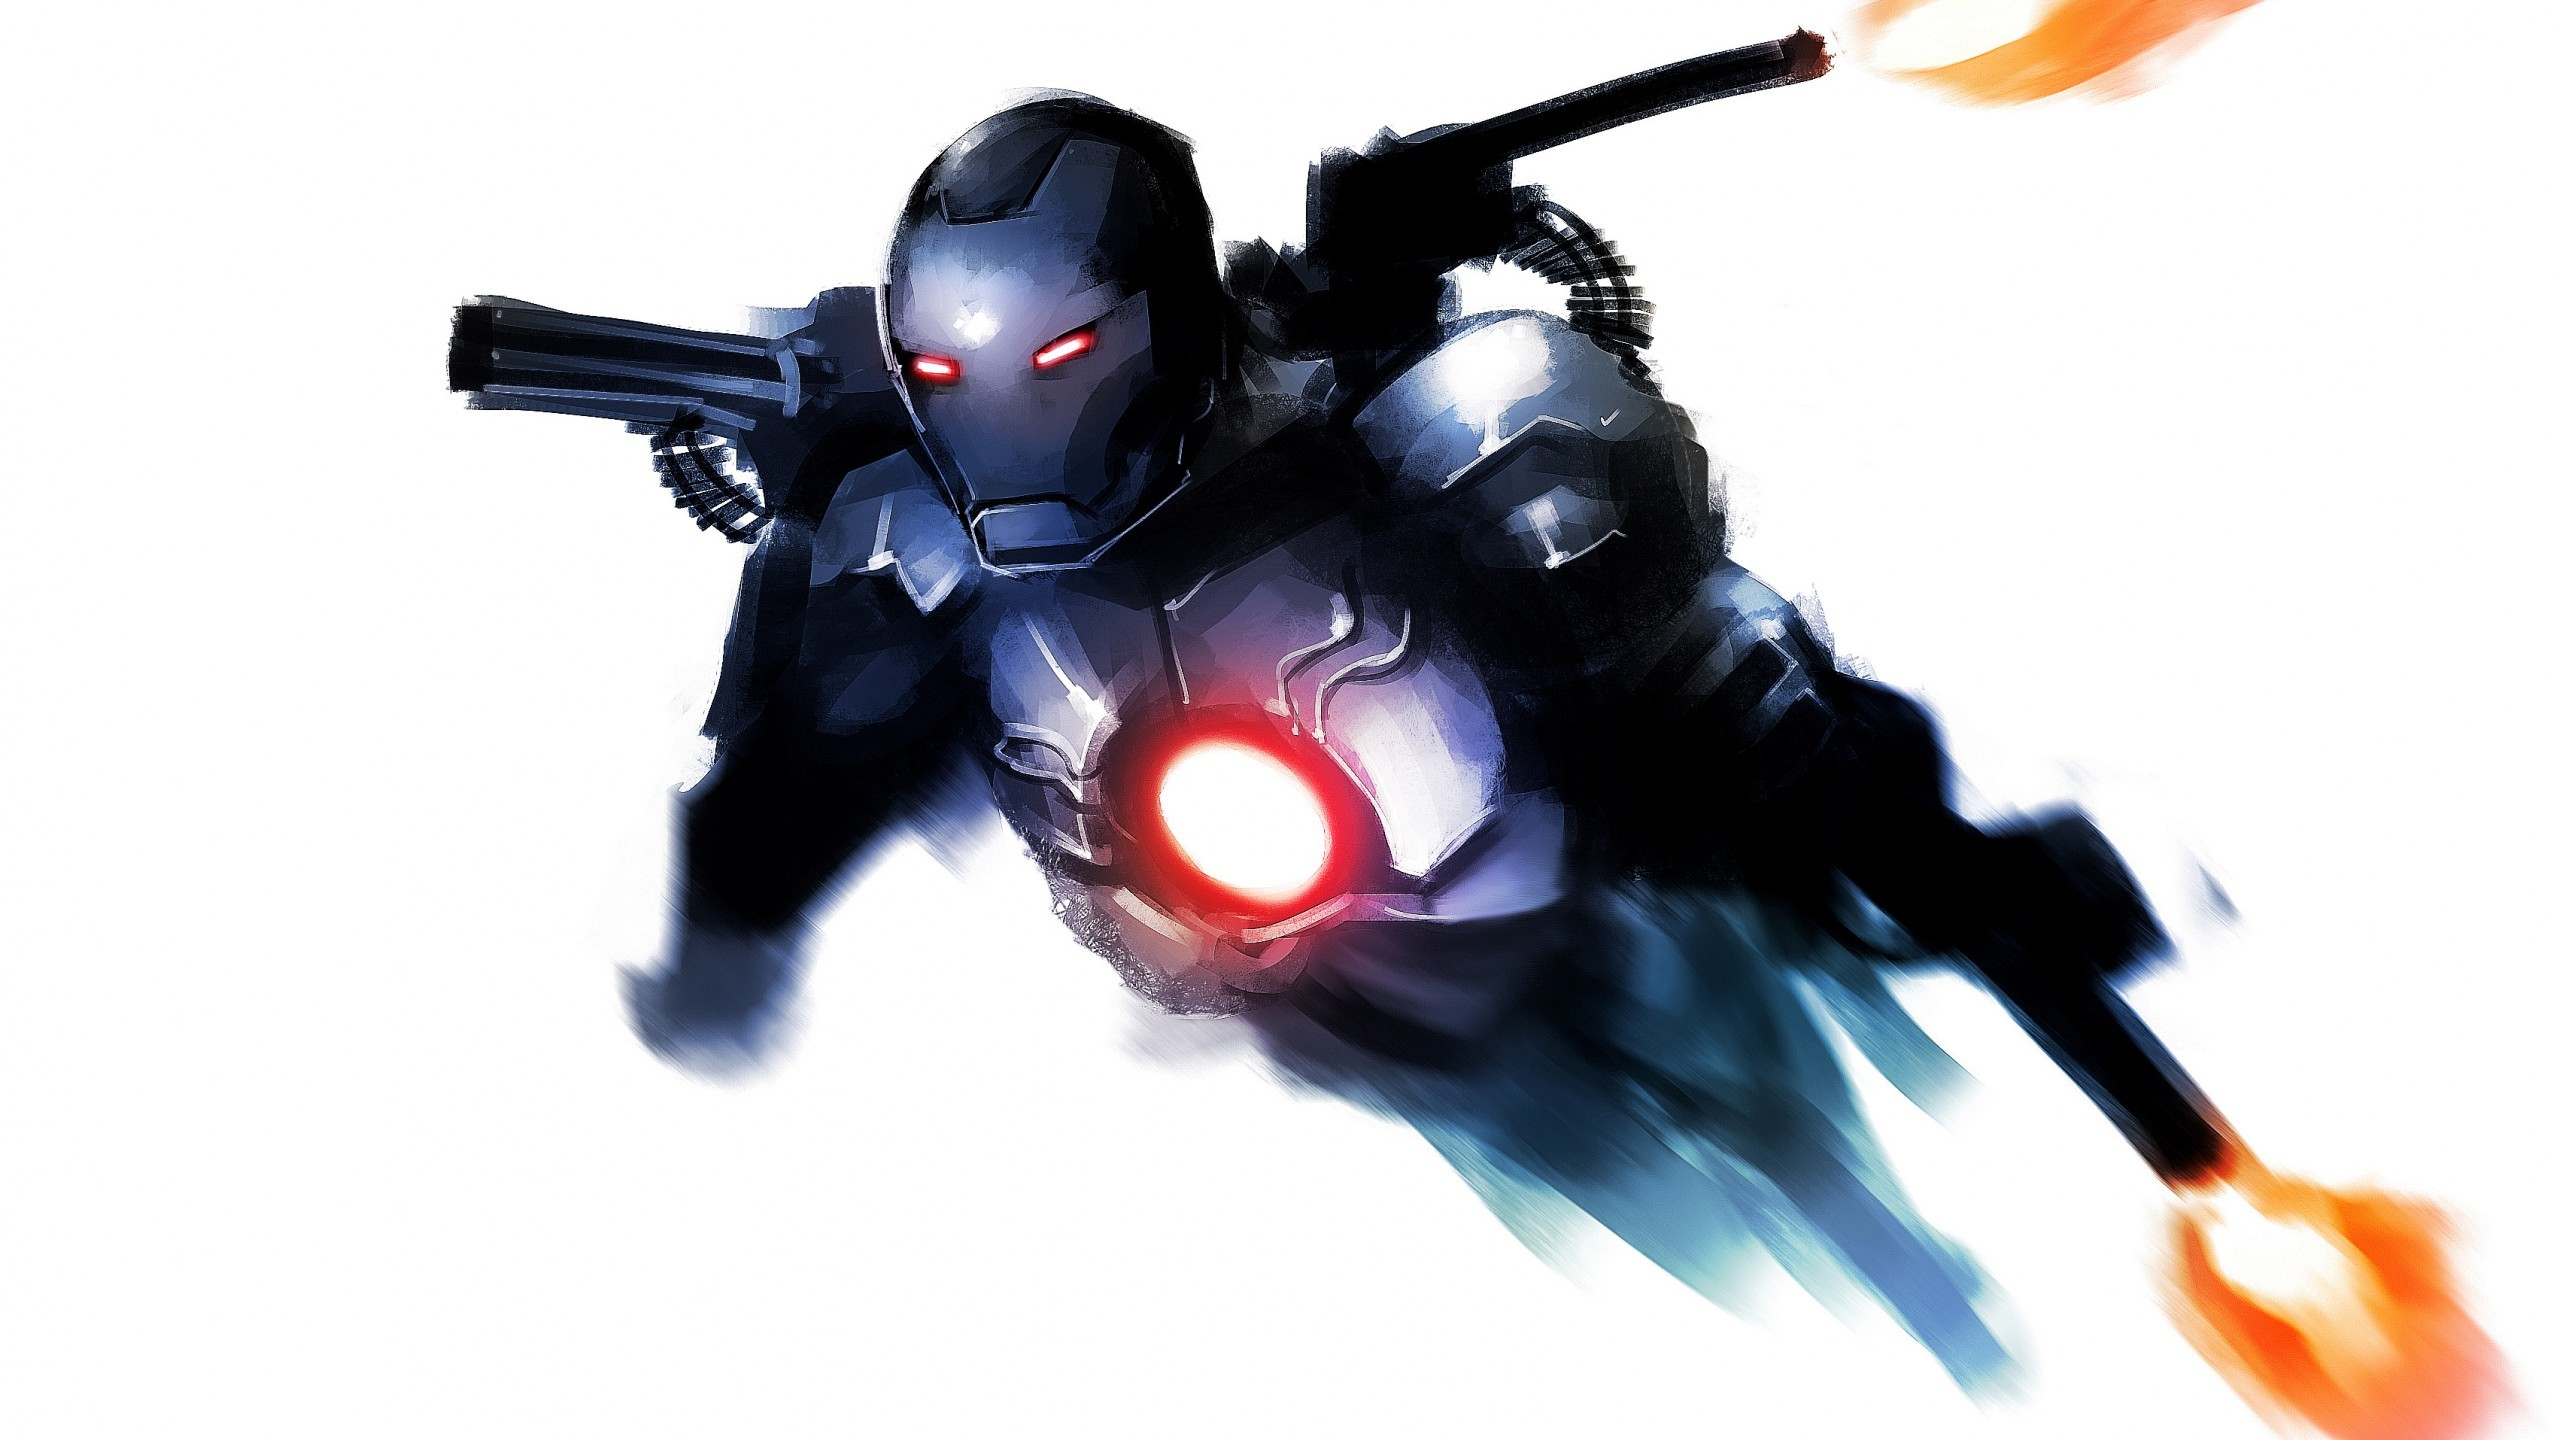 Tags: Iron Man …